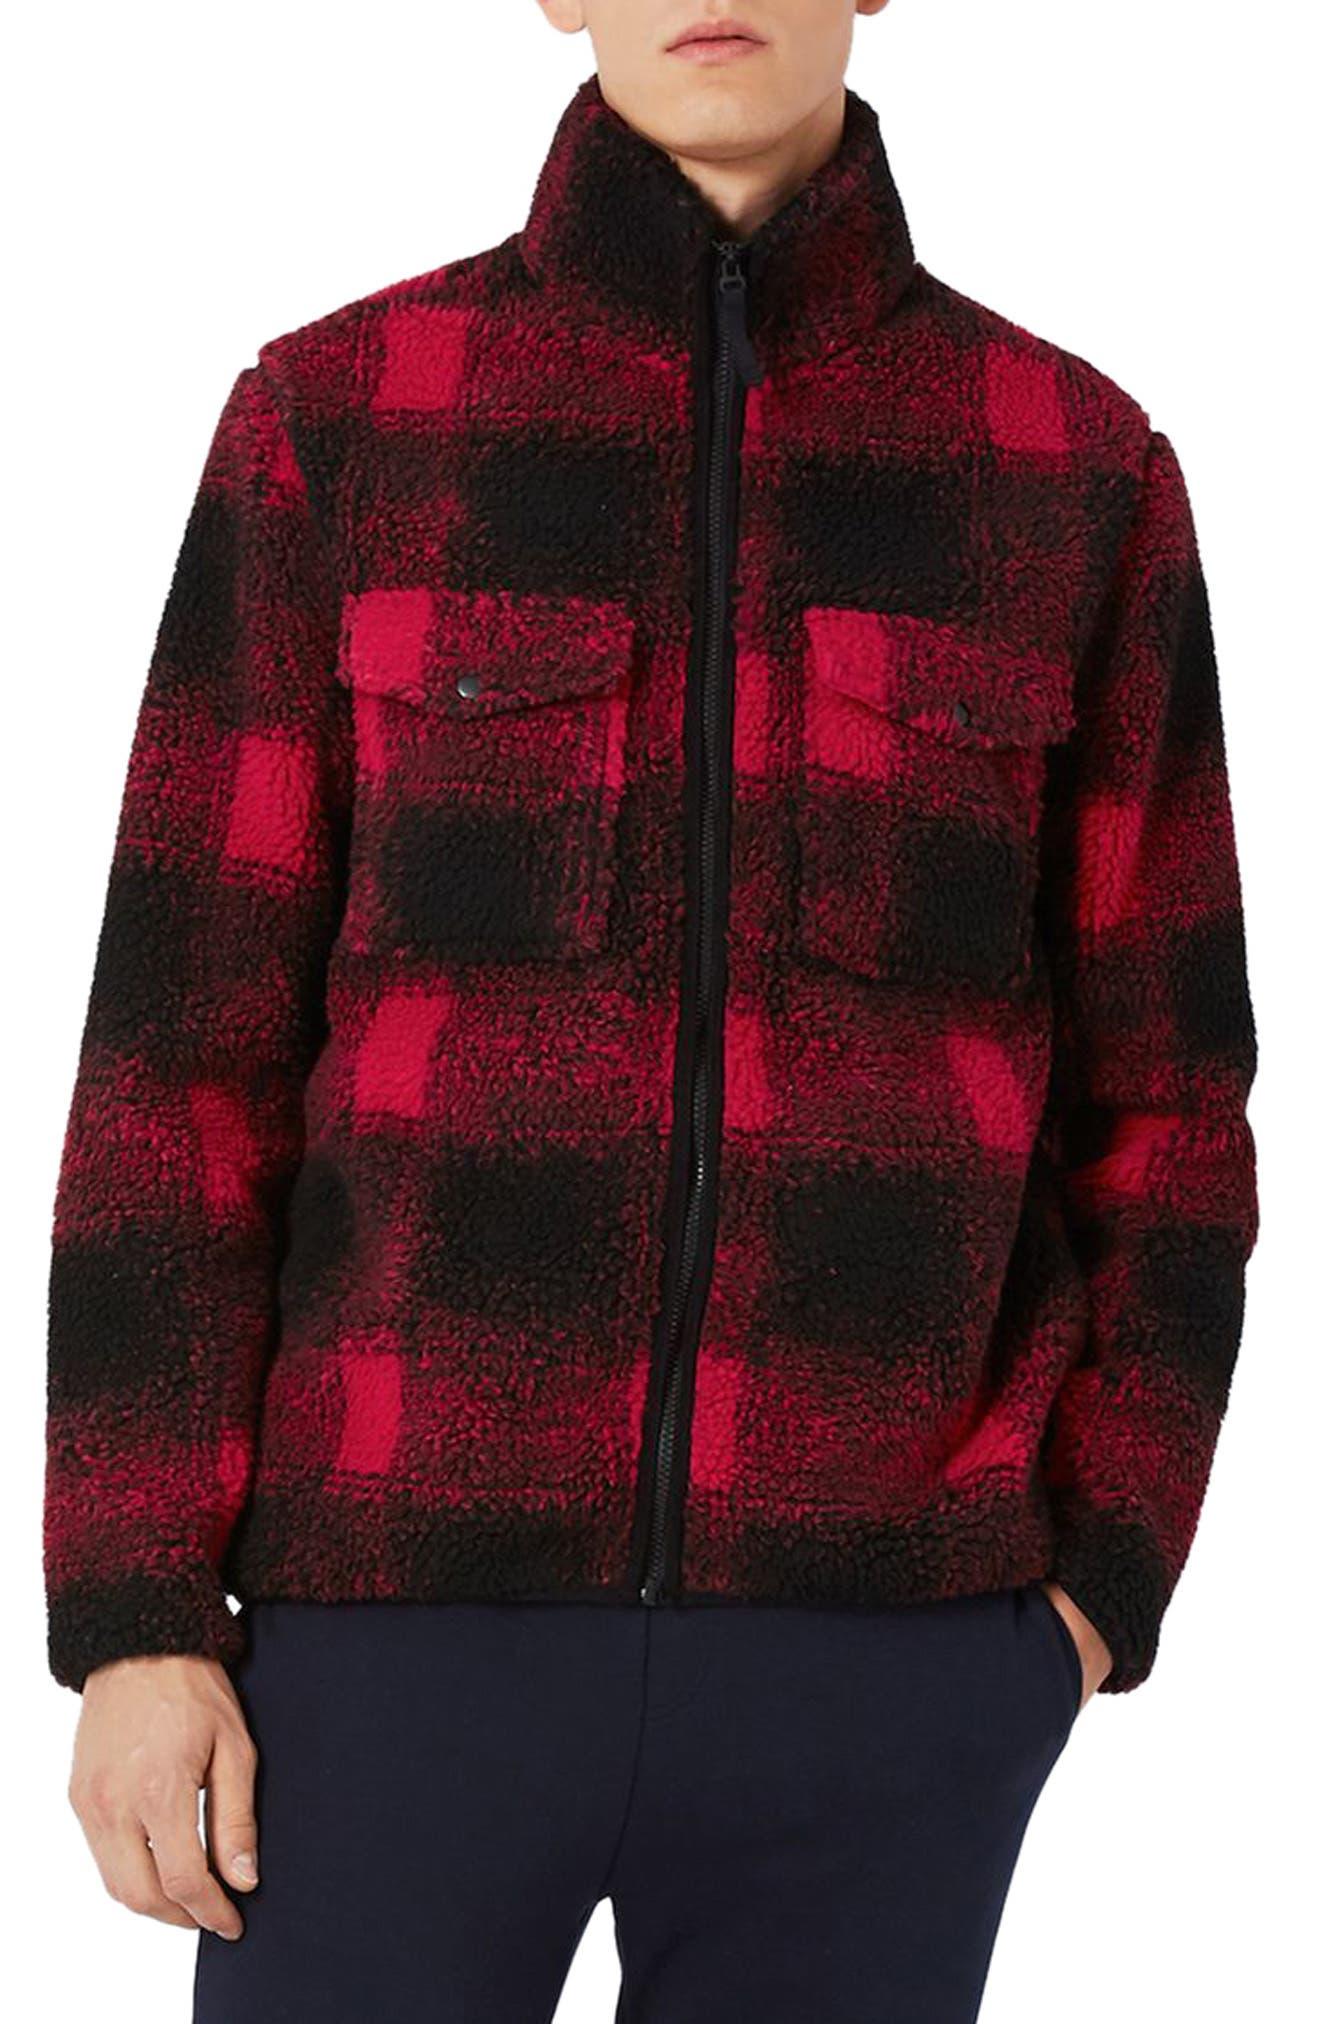 Buffalo Check Borg Jacket,                         Main,                         color, Red Multi